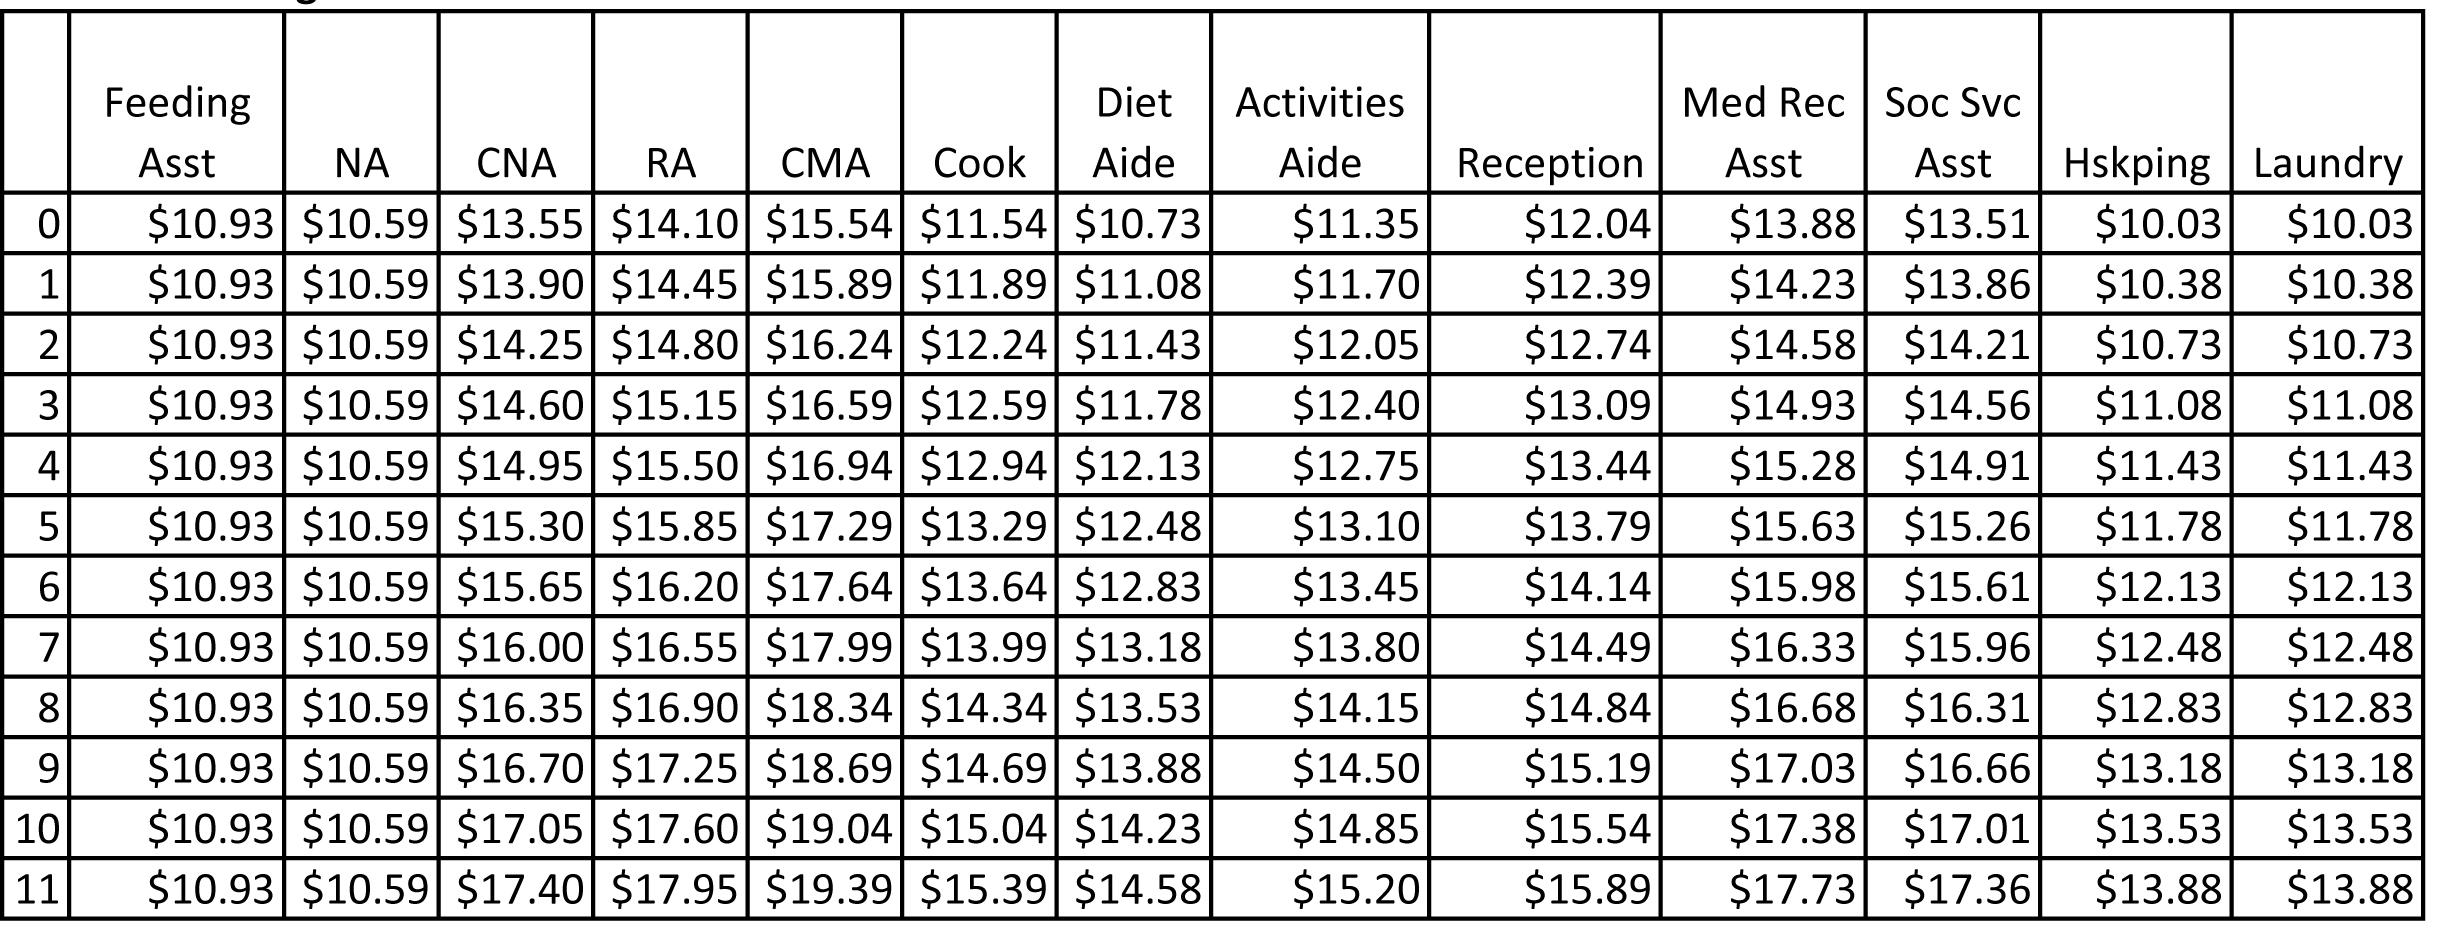 2015 Alliance Wage Scales 2015 incluido.xlsx